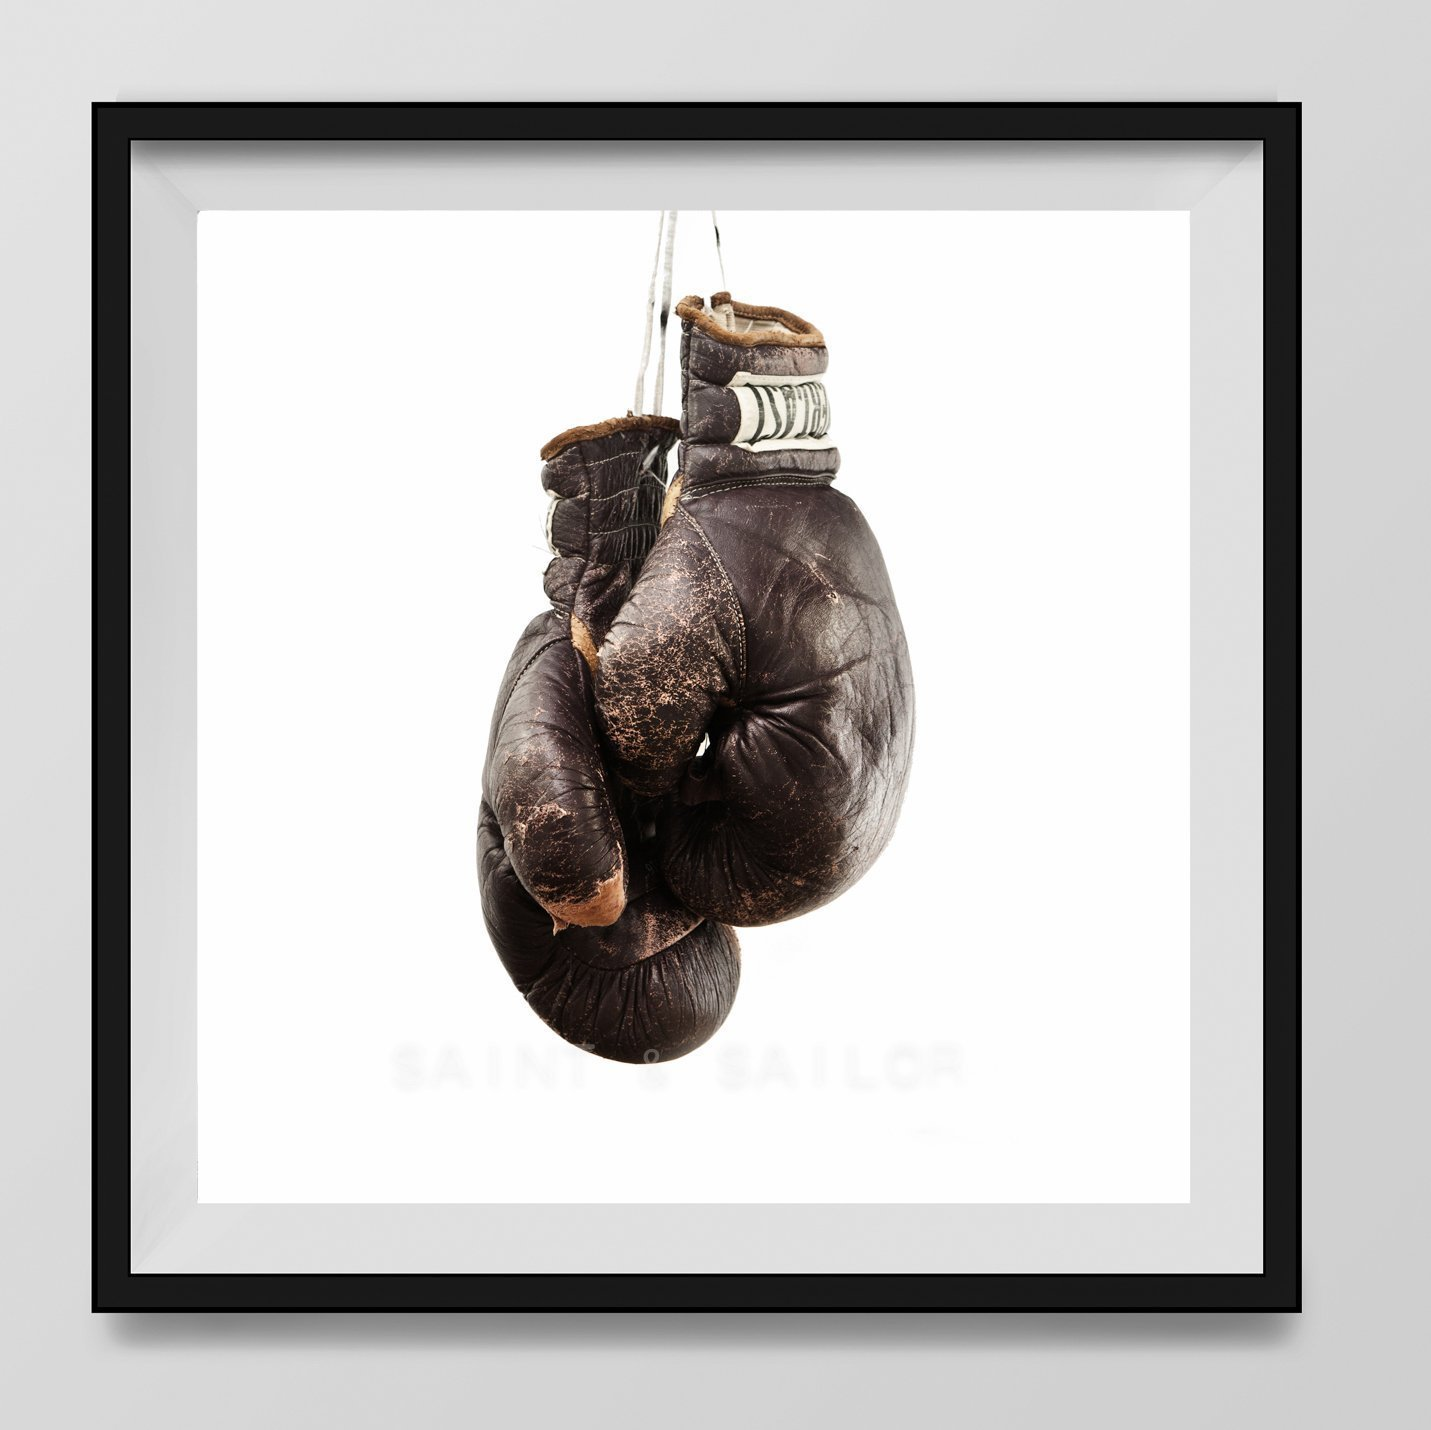 Vintage Boxing Gloves on White Background Fine Art Photography Print, Vintage Sports Nursery Art, Sports Decor, Man Cave art, Sport Prints, Boys Nursery decor, Kids Room Wall Art,